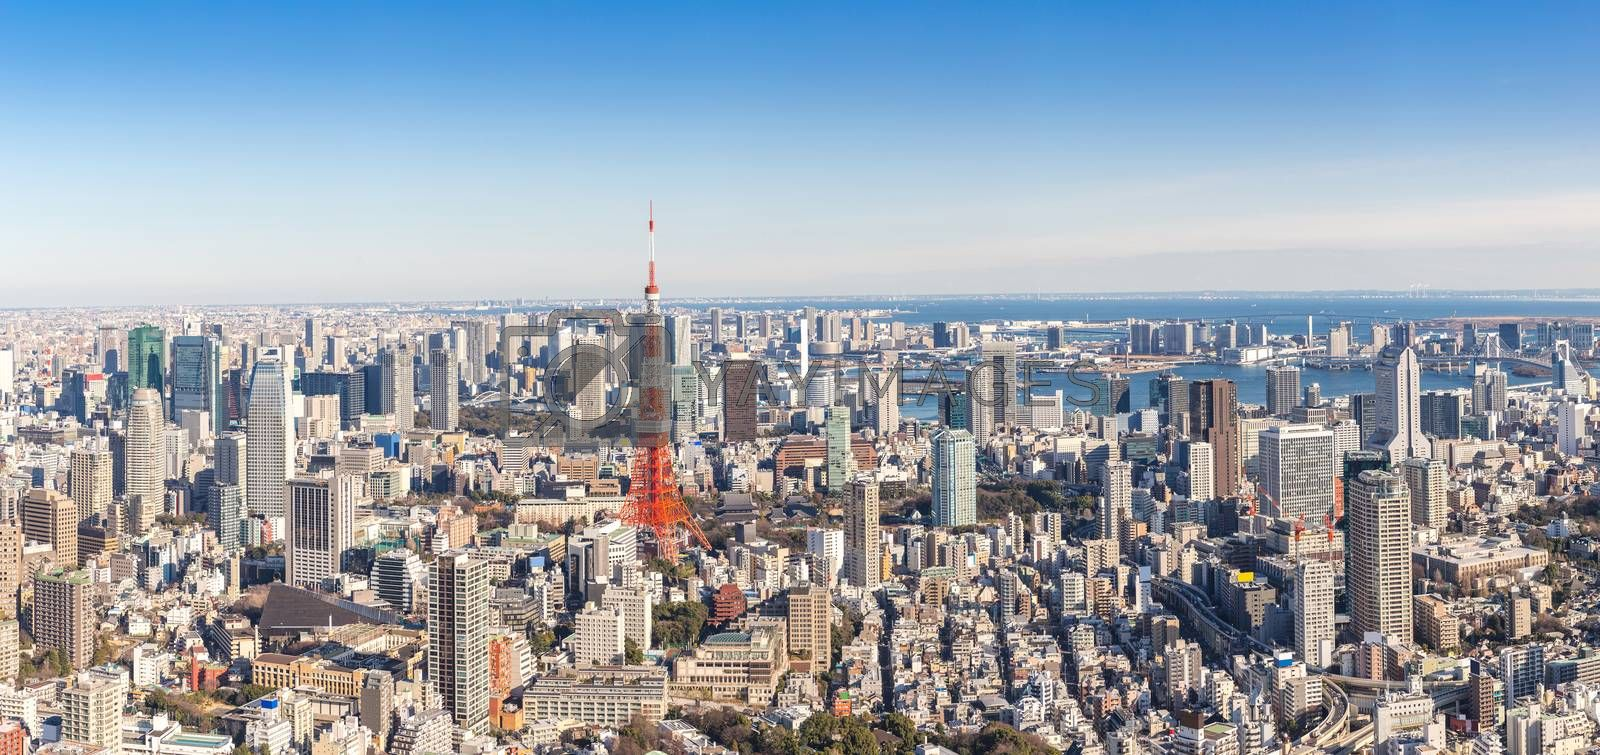 Tokyo Tower with skyline in Tokyo Japan Panorama